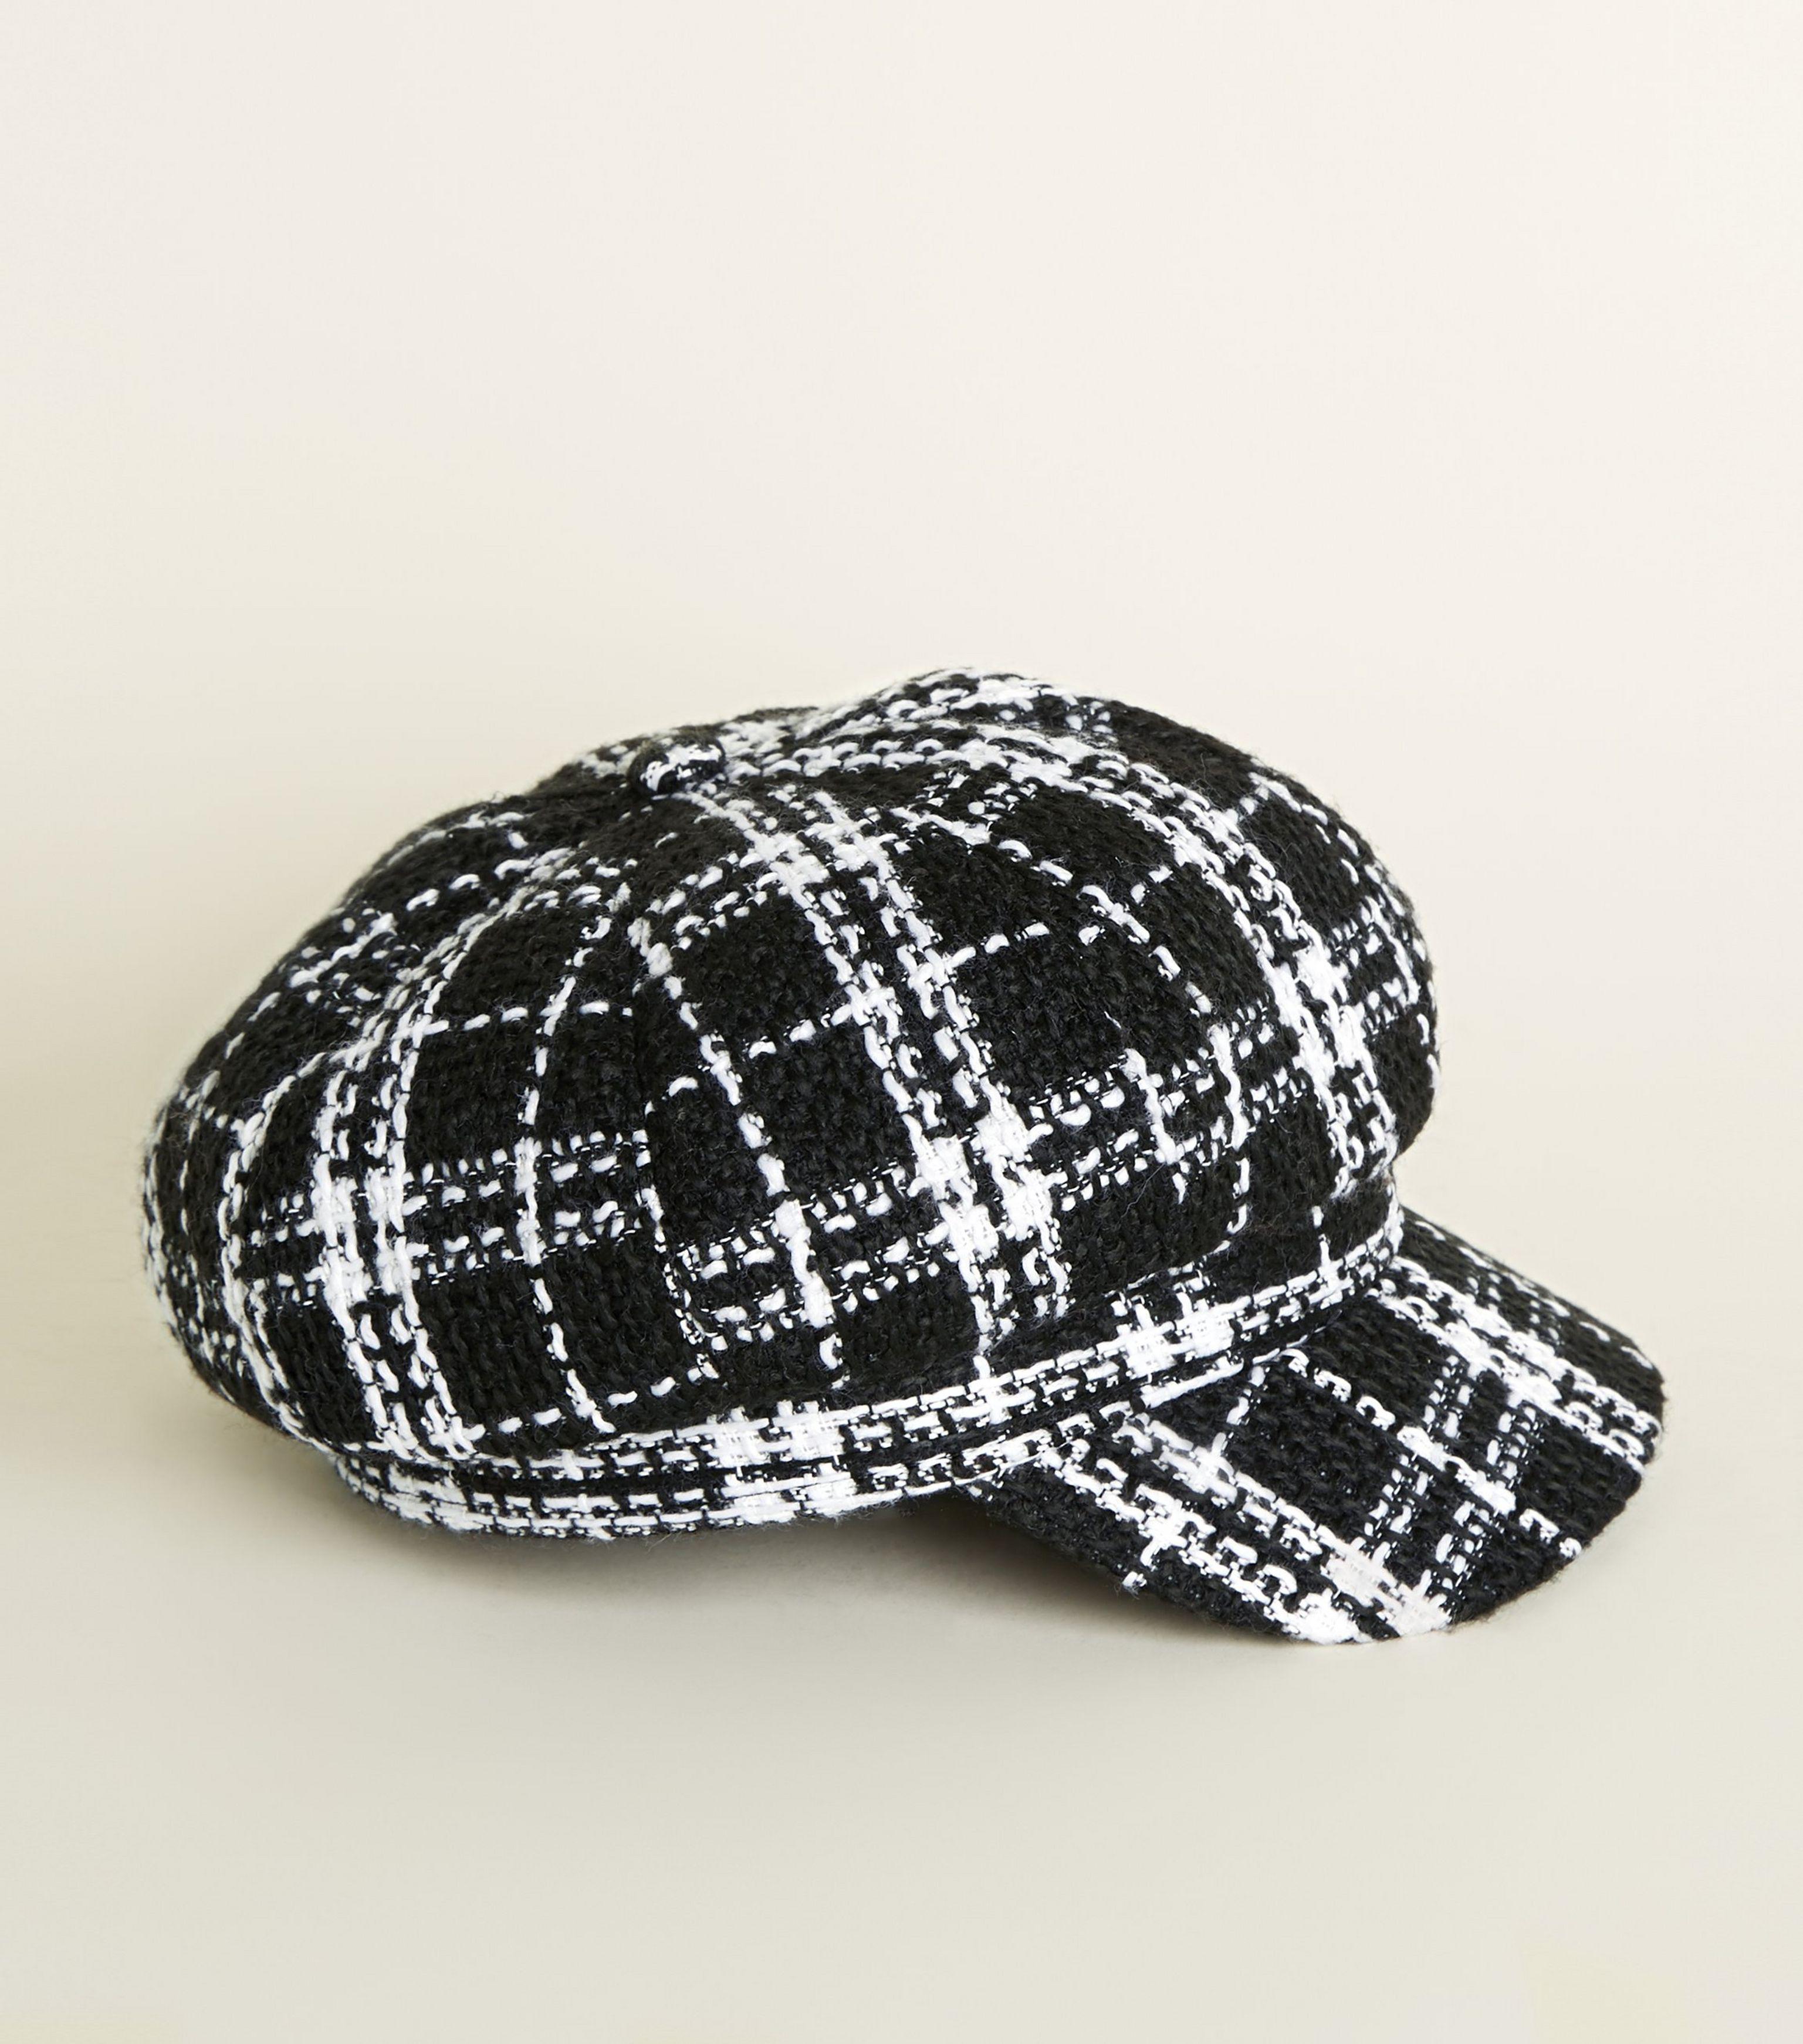 fab6ff1108307 New Look Black Bouclé Check Baker Boy Cap in Black - Lyst